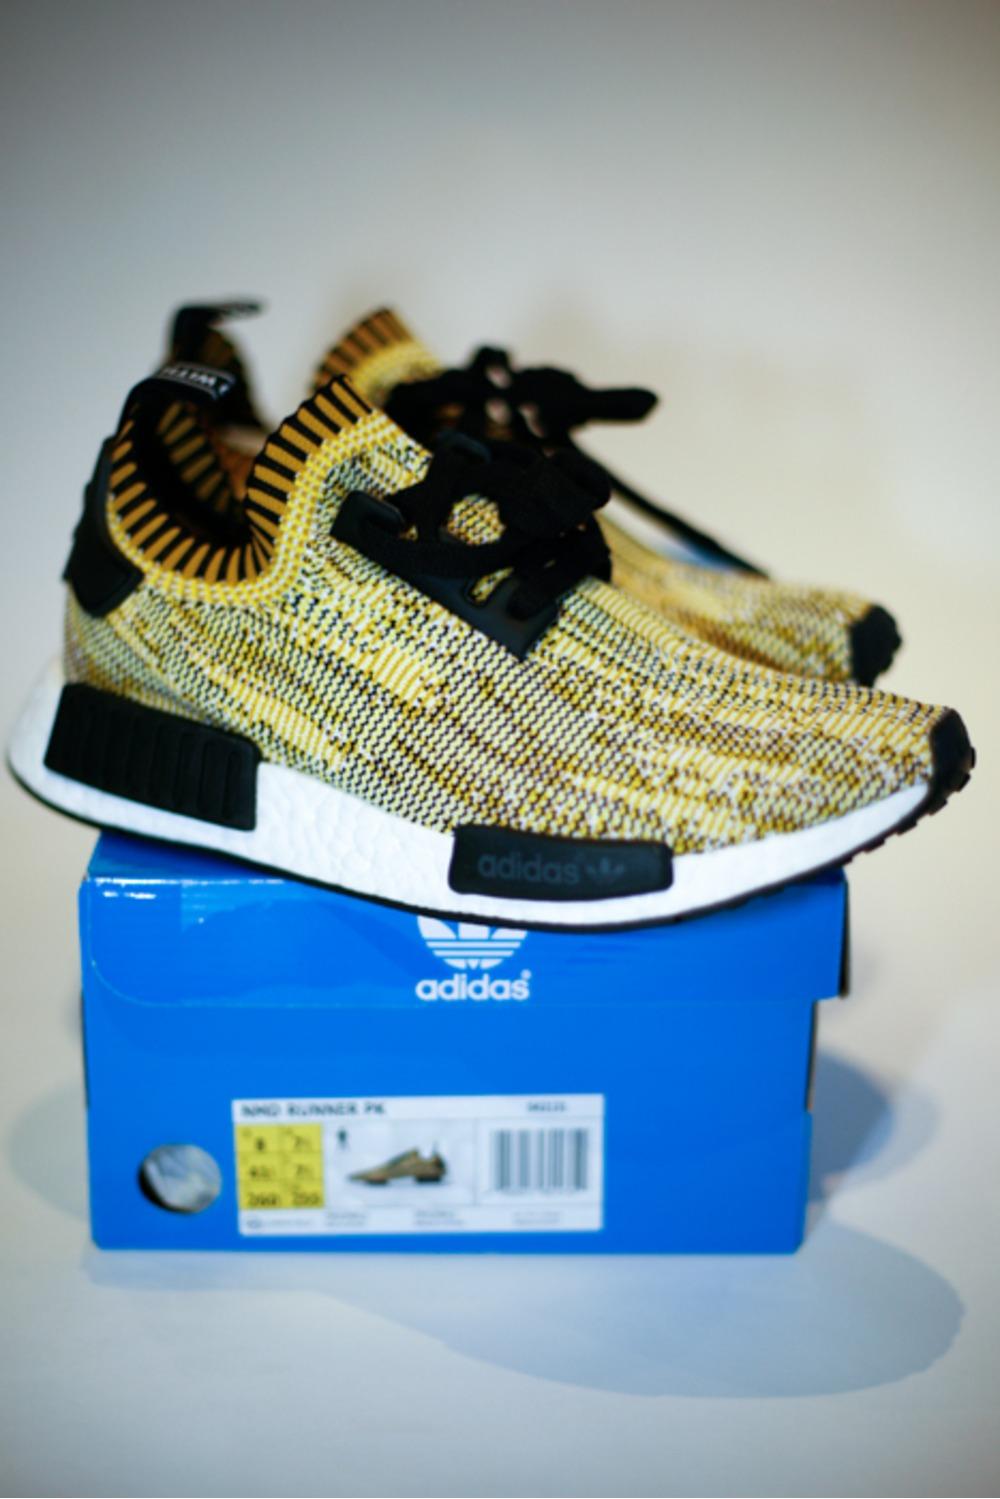 Bape x Adidas nmd r1 ba7326 on Feet Review